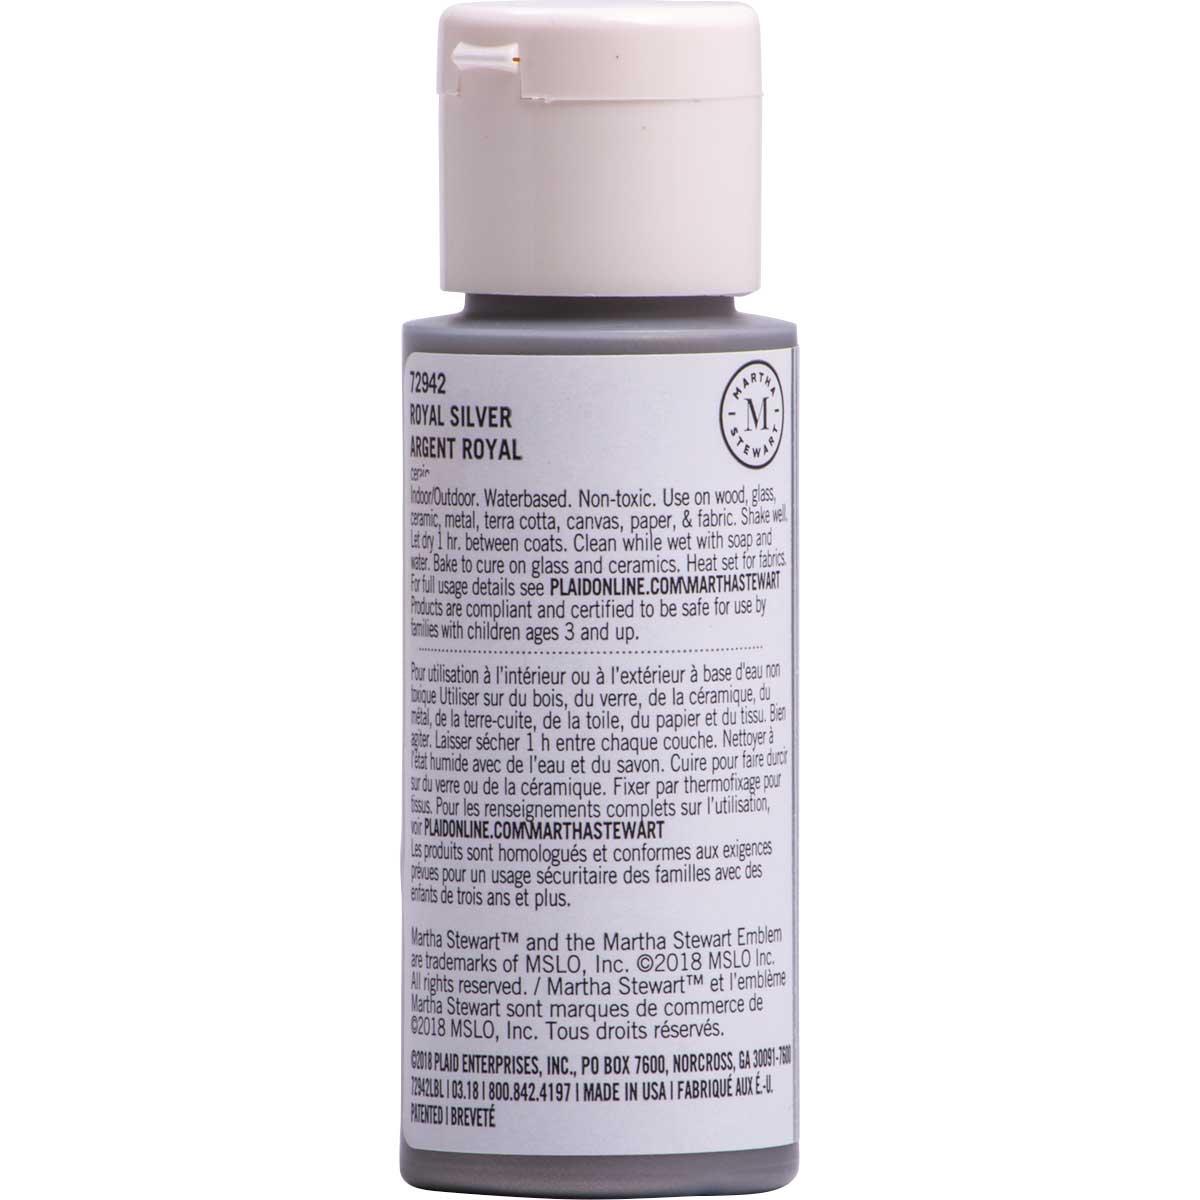 Martha Stewart ® Multi-Surface Metallic Acrylic Craft Paint CPSIA - Royal Silver, 2 oz. - 72942